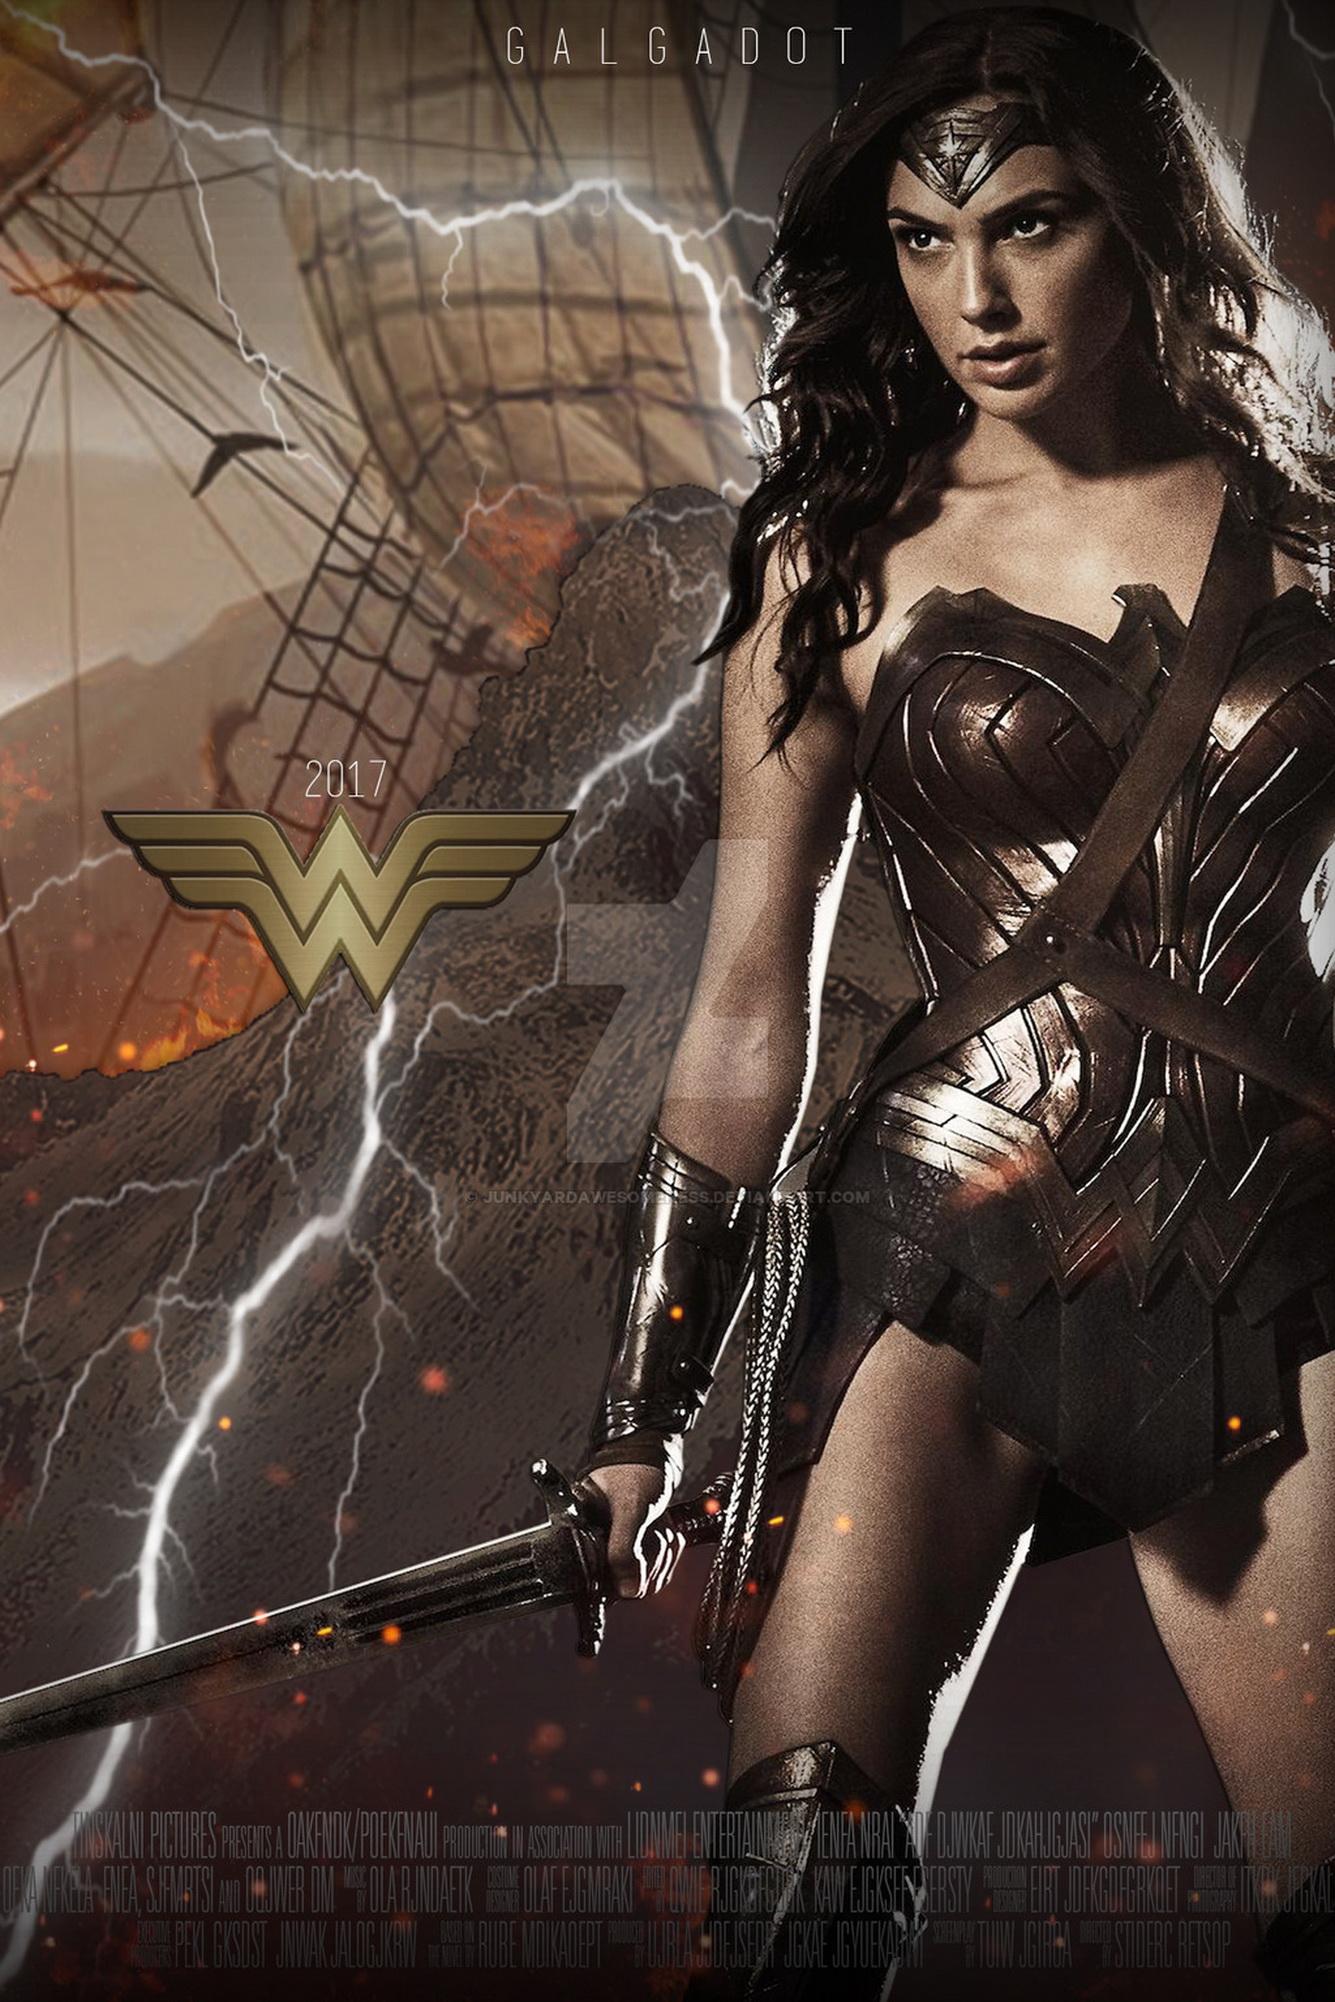 Back to FULL gallery Gal Gadot – 'Superman vs Batman' 'Wonder ... Katy Perry